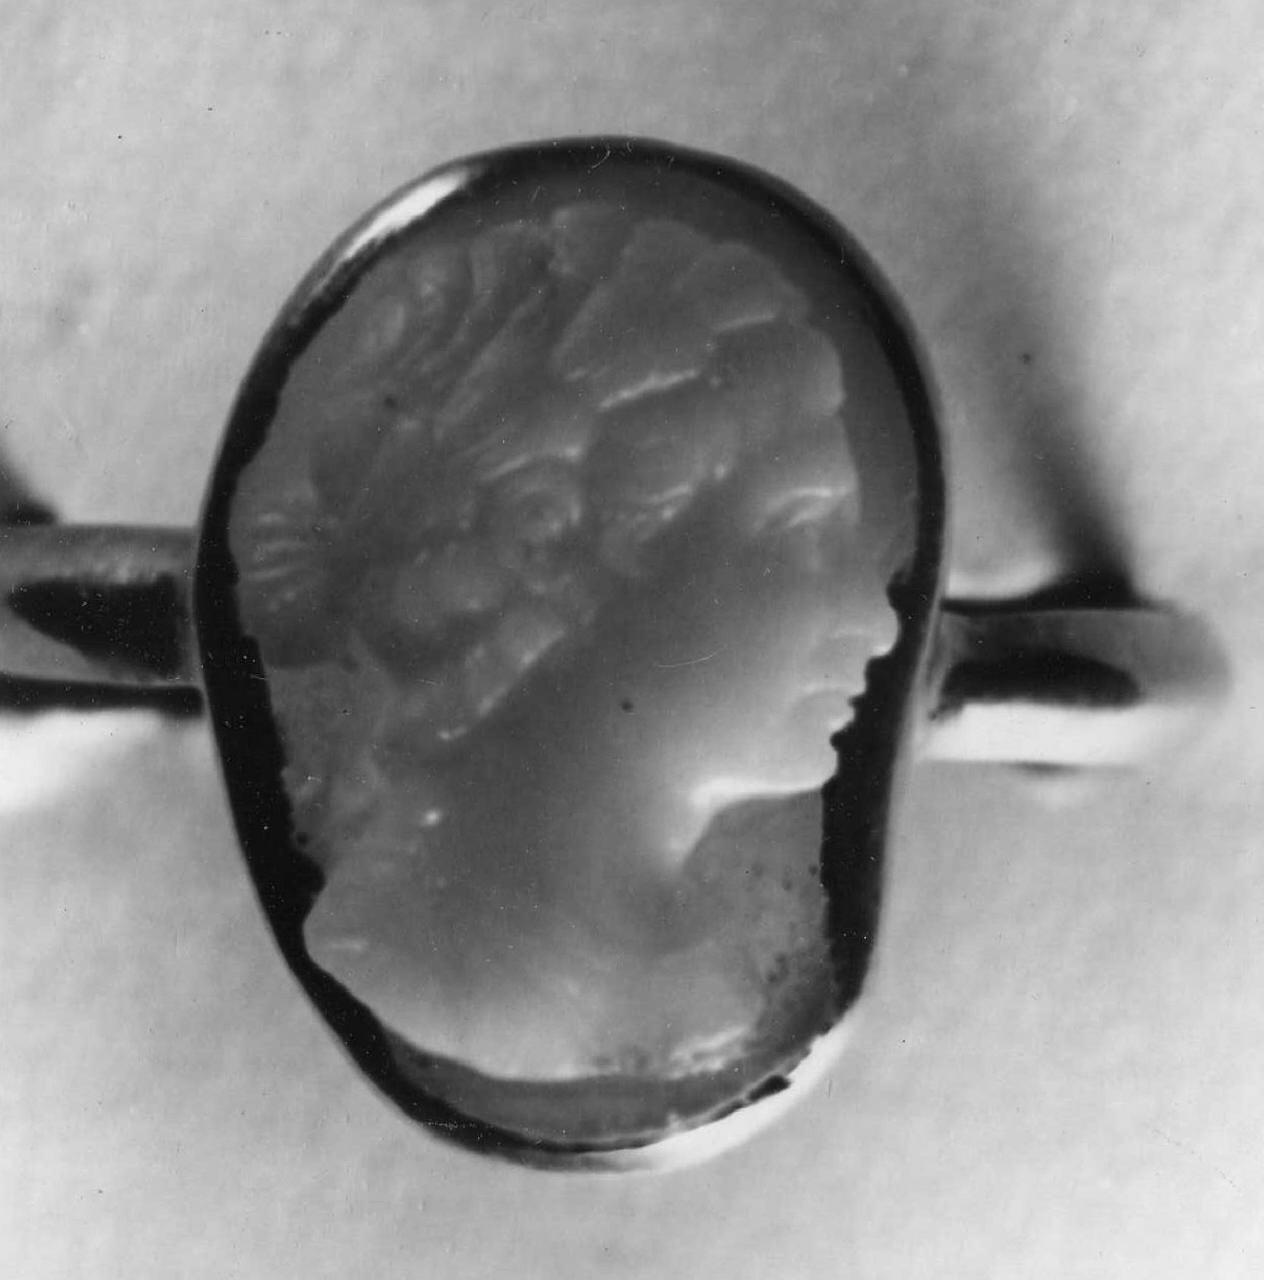 testa d'uomo di profilo (cammeo) - bottega italiana (sec. XVII)